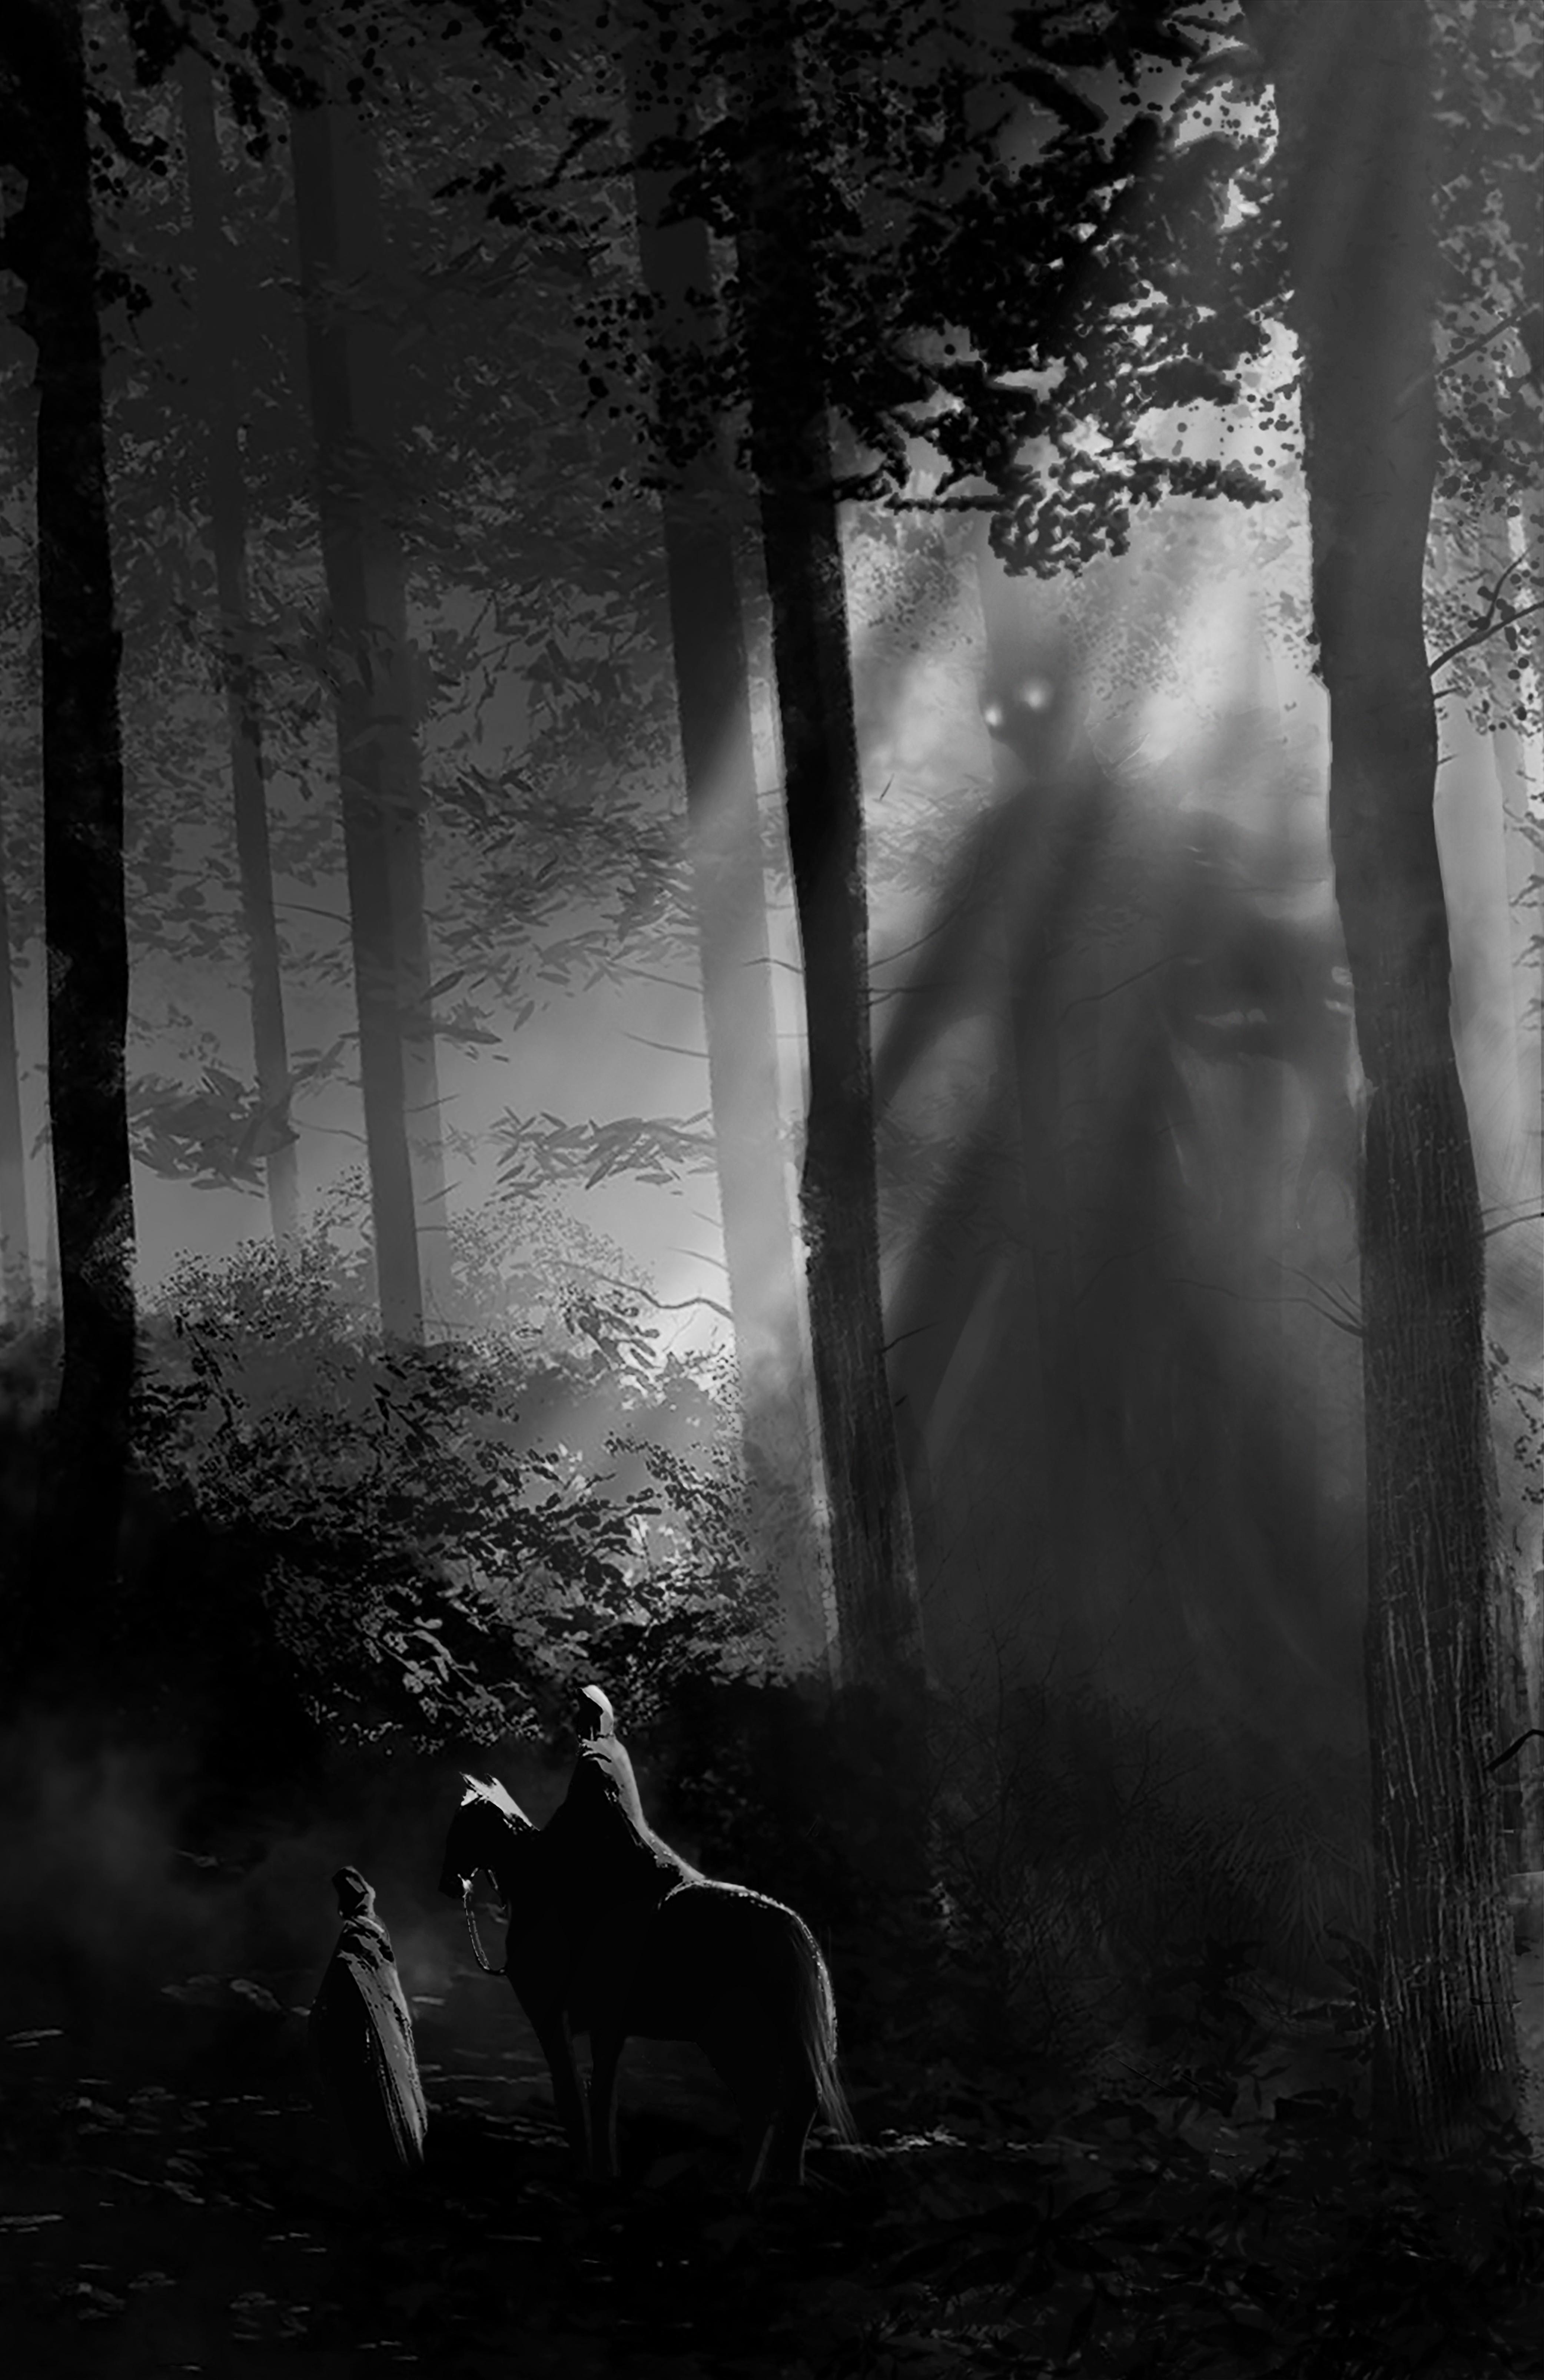 Ominous horror novel needs illustration of main villain to set tone/invoke dread